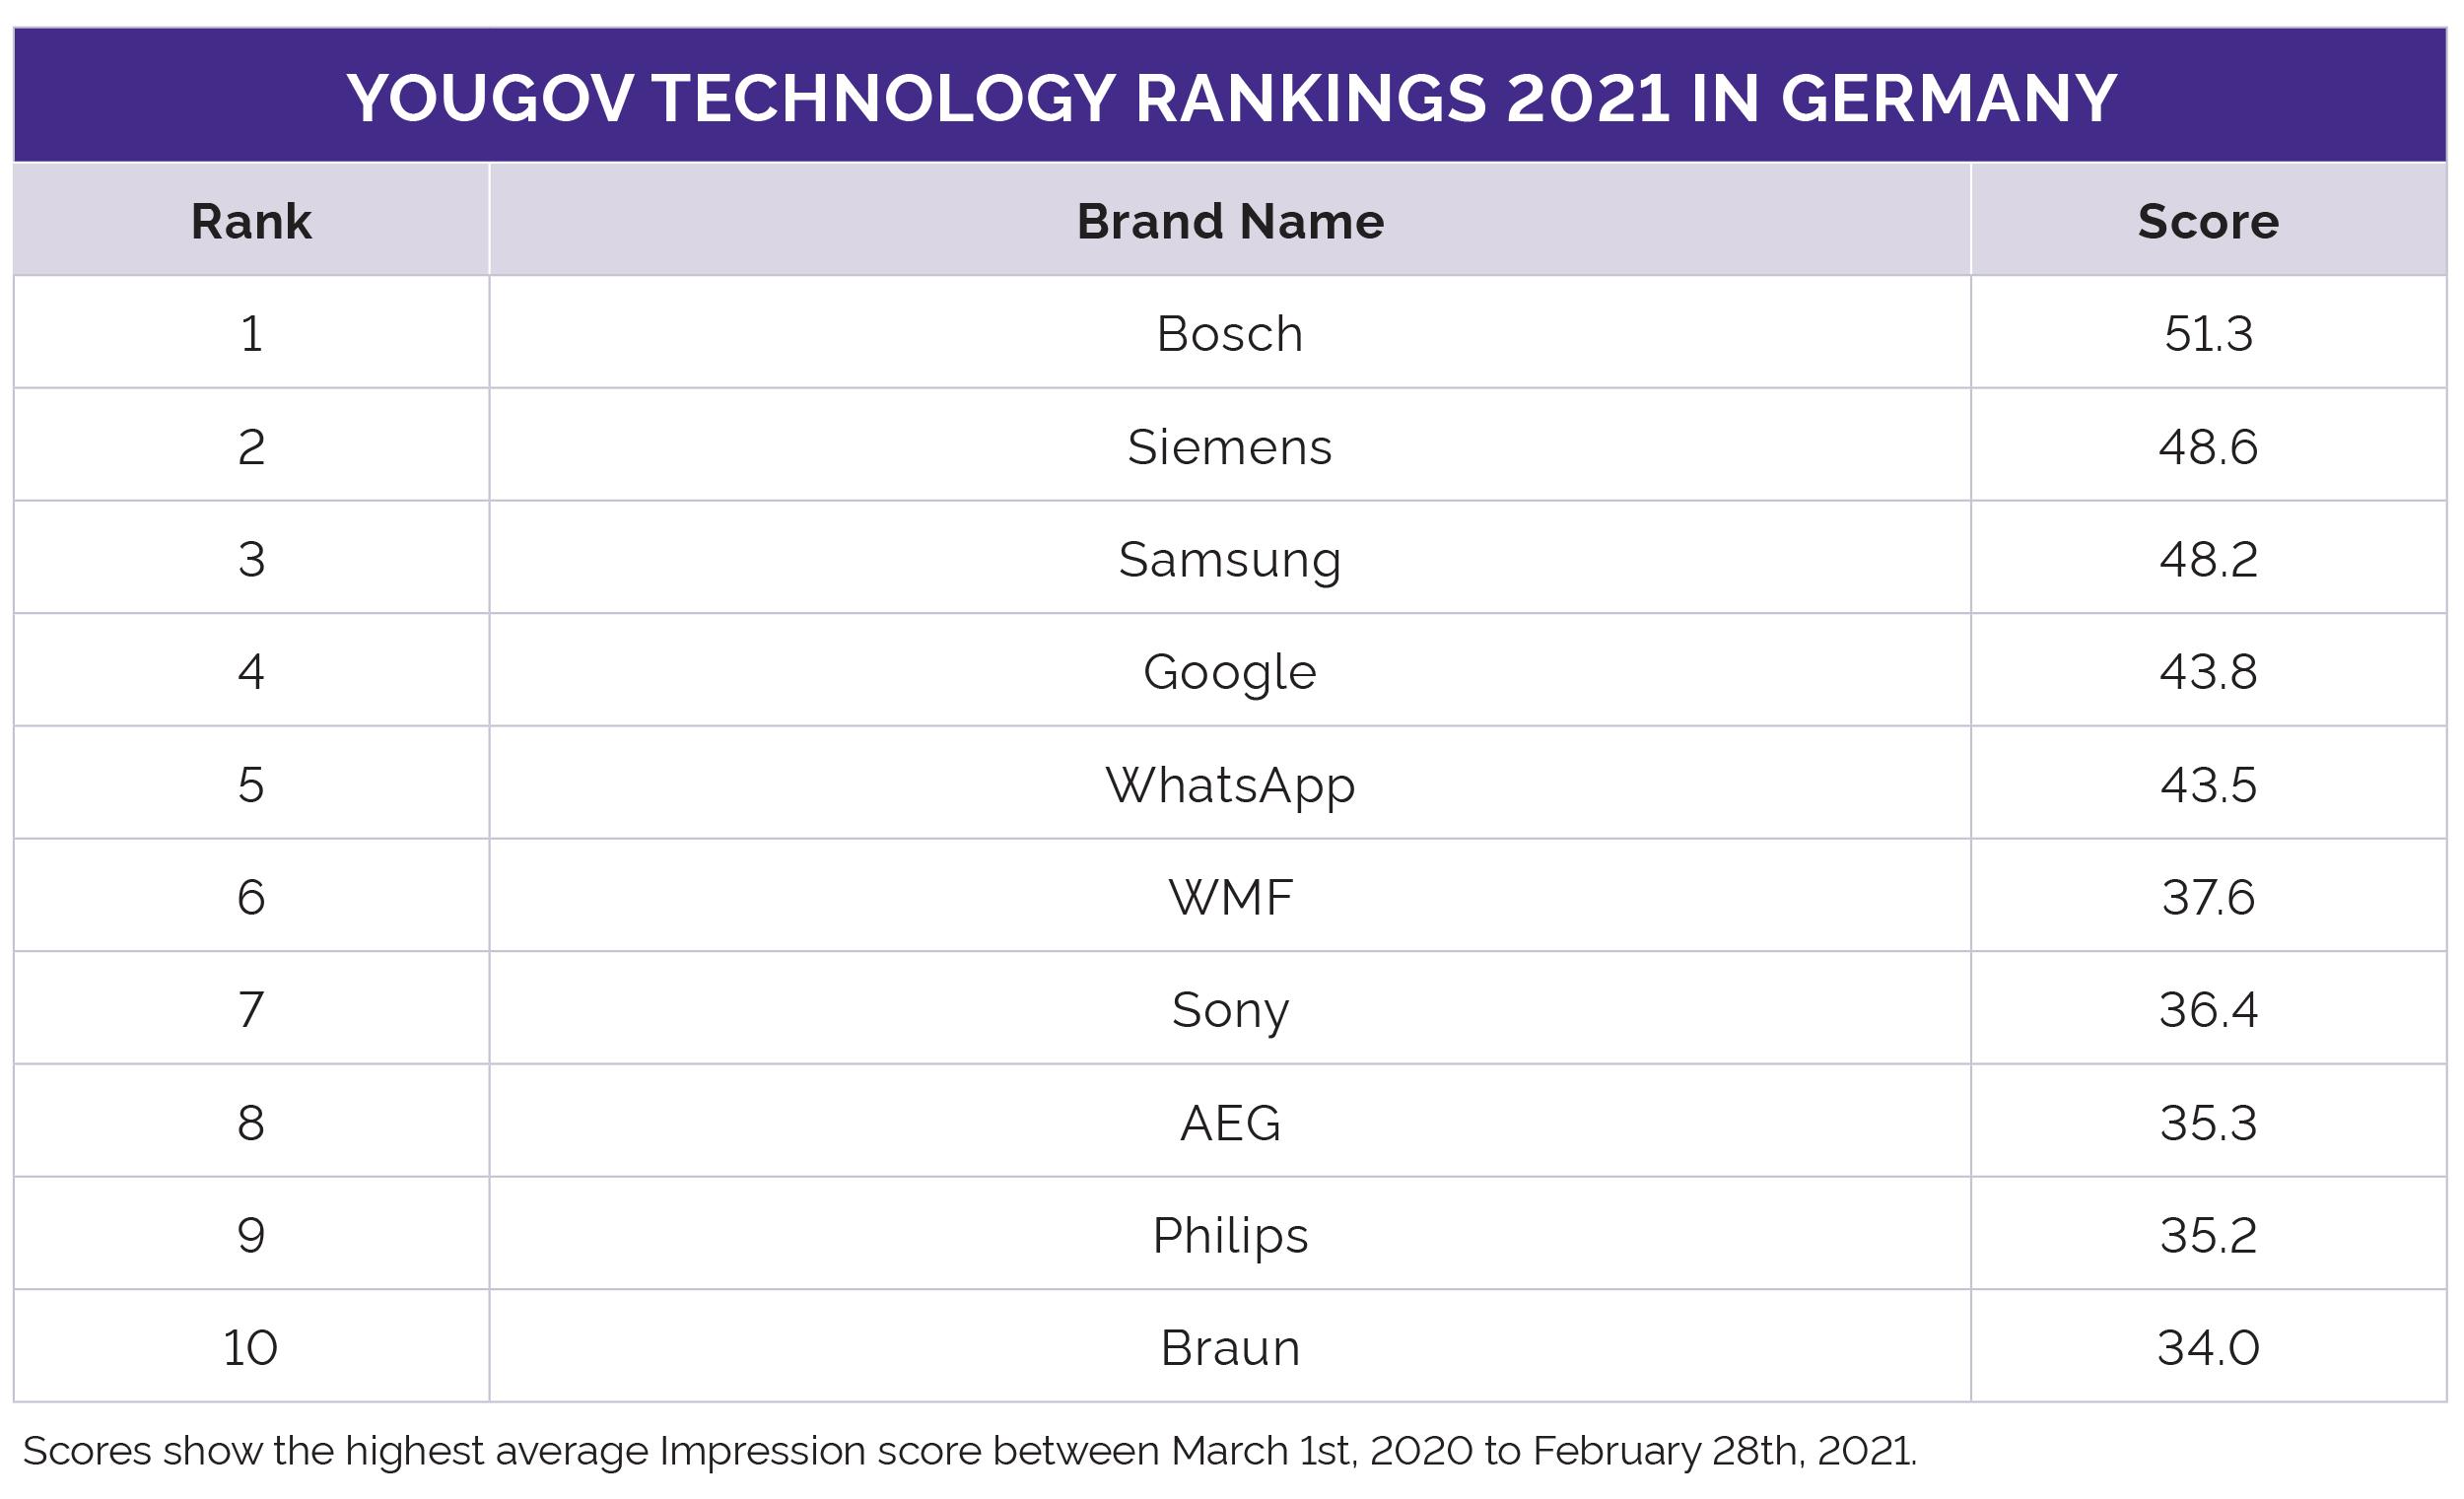 Technology Ranking 2021 Germany